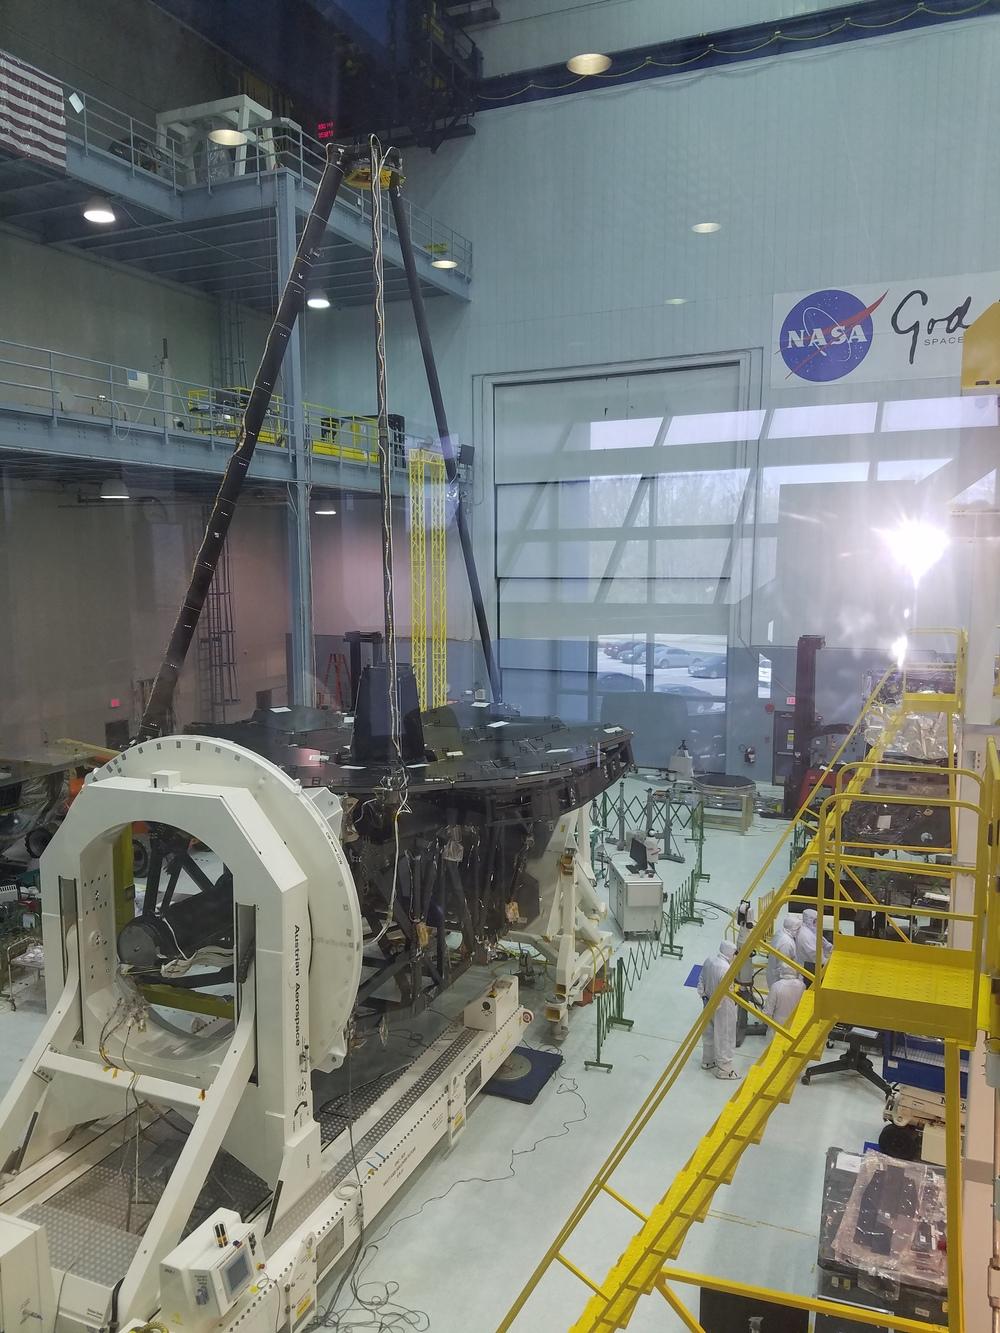 James Webb Space Telescope!